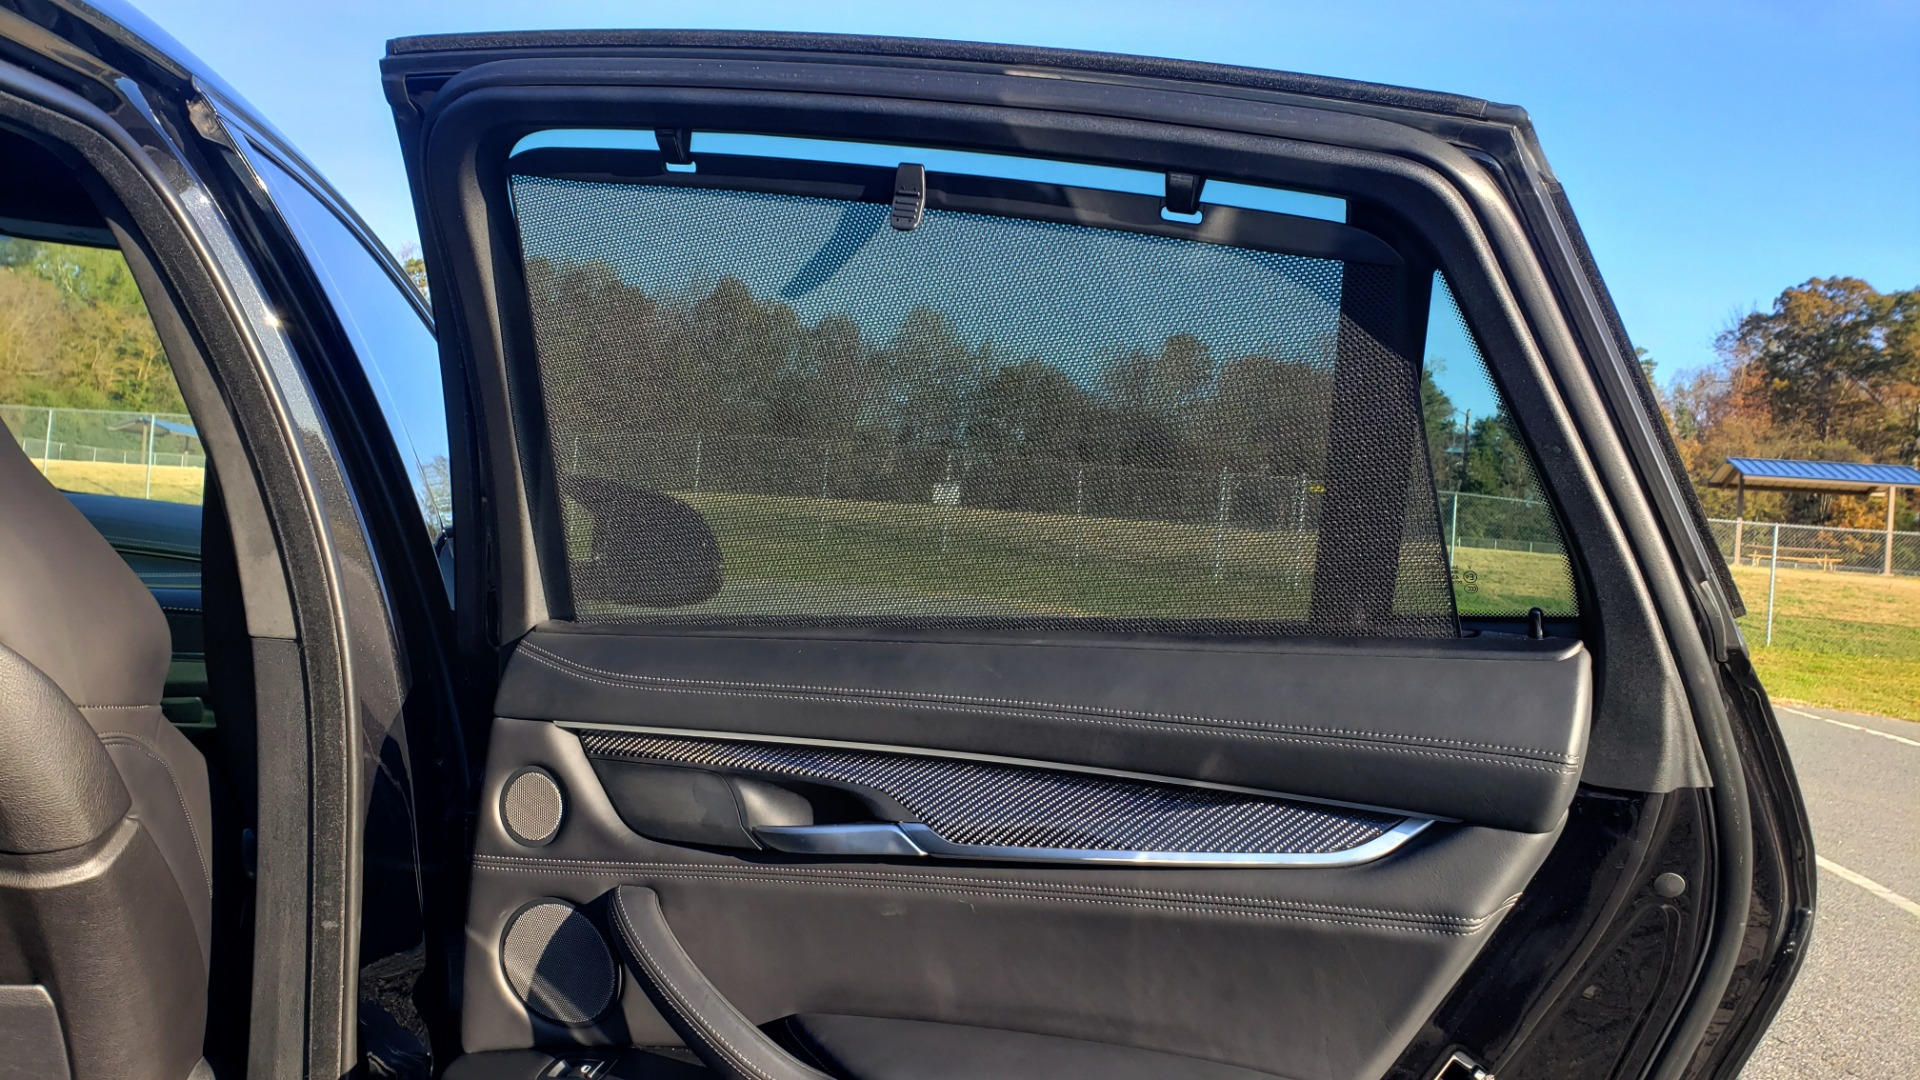 Used 2016 BMW X6 M EXEC PKG / DRVR ASST / NAV / SUNROOF / BLIND SPOT / REARVIEW for sale Sold at Formula Imports in Charlotte NC 28227 76